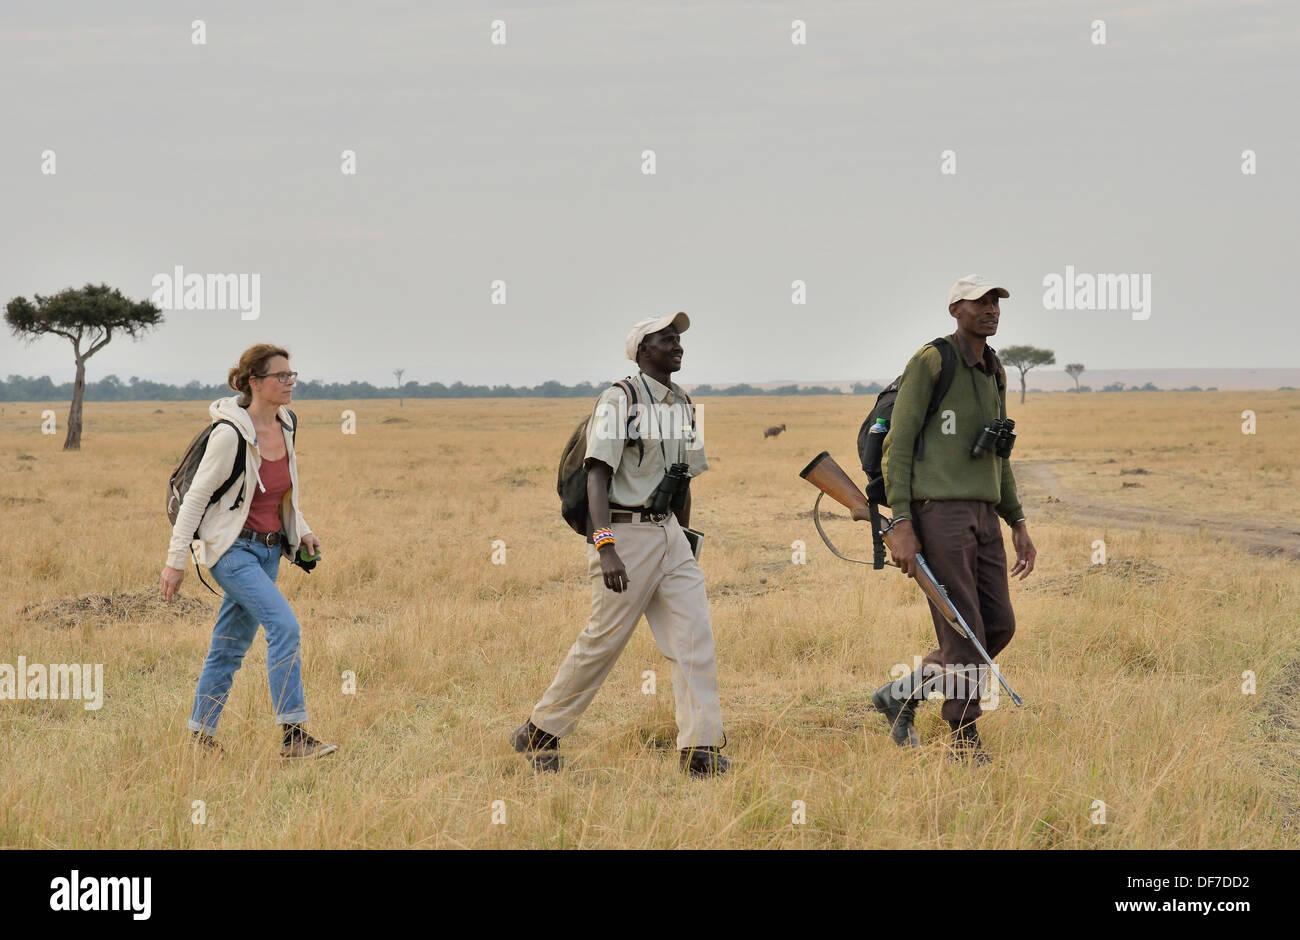 Tourist with armed guard and guide on a walking safari, Massai Mara, Serengeti, Rift Valley province, Kenya - Stock Image